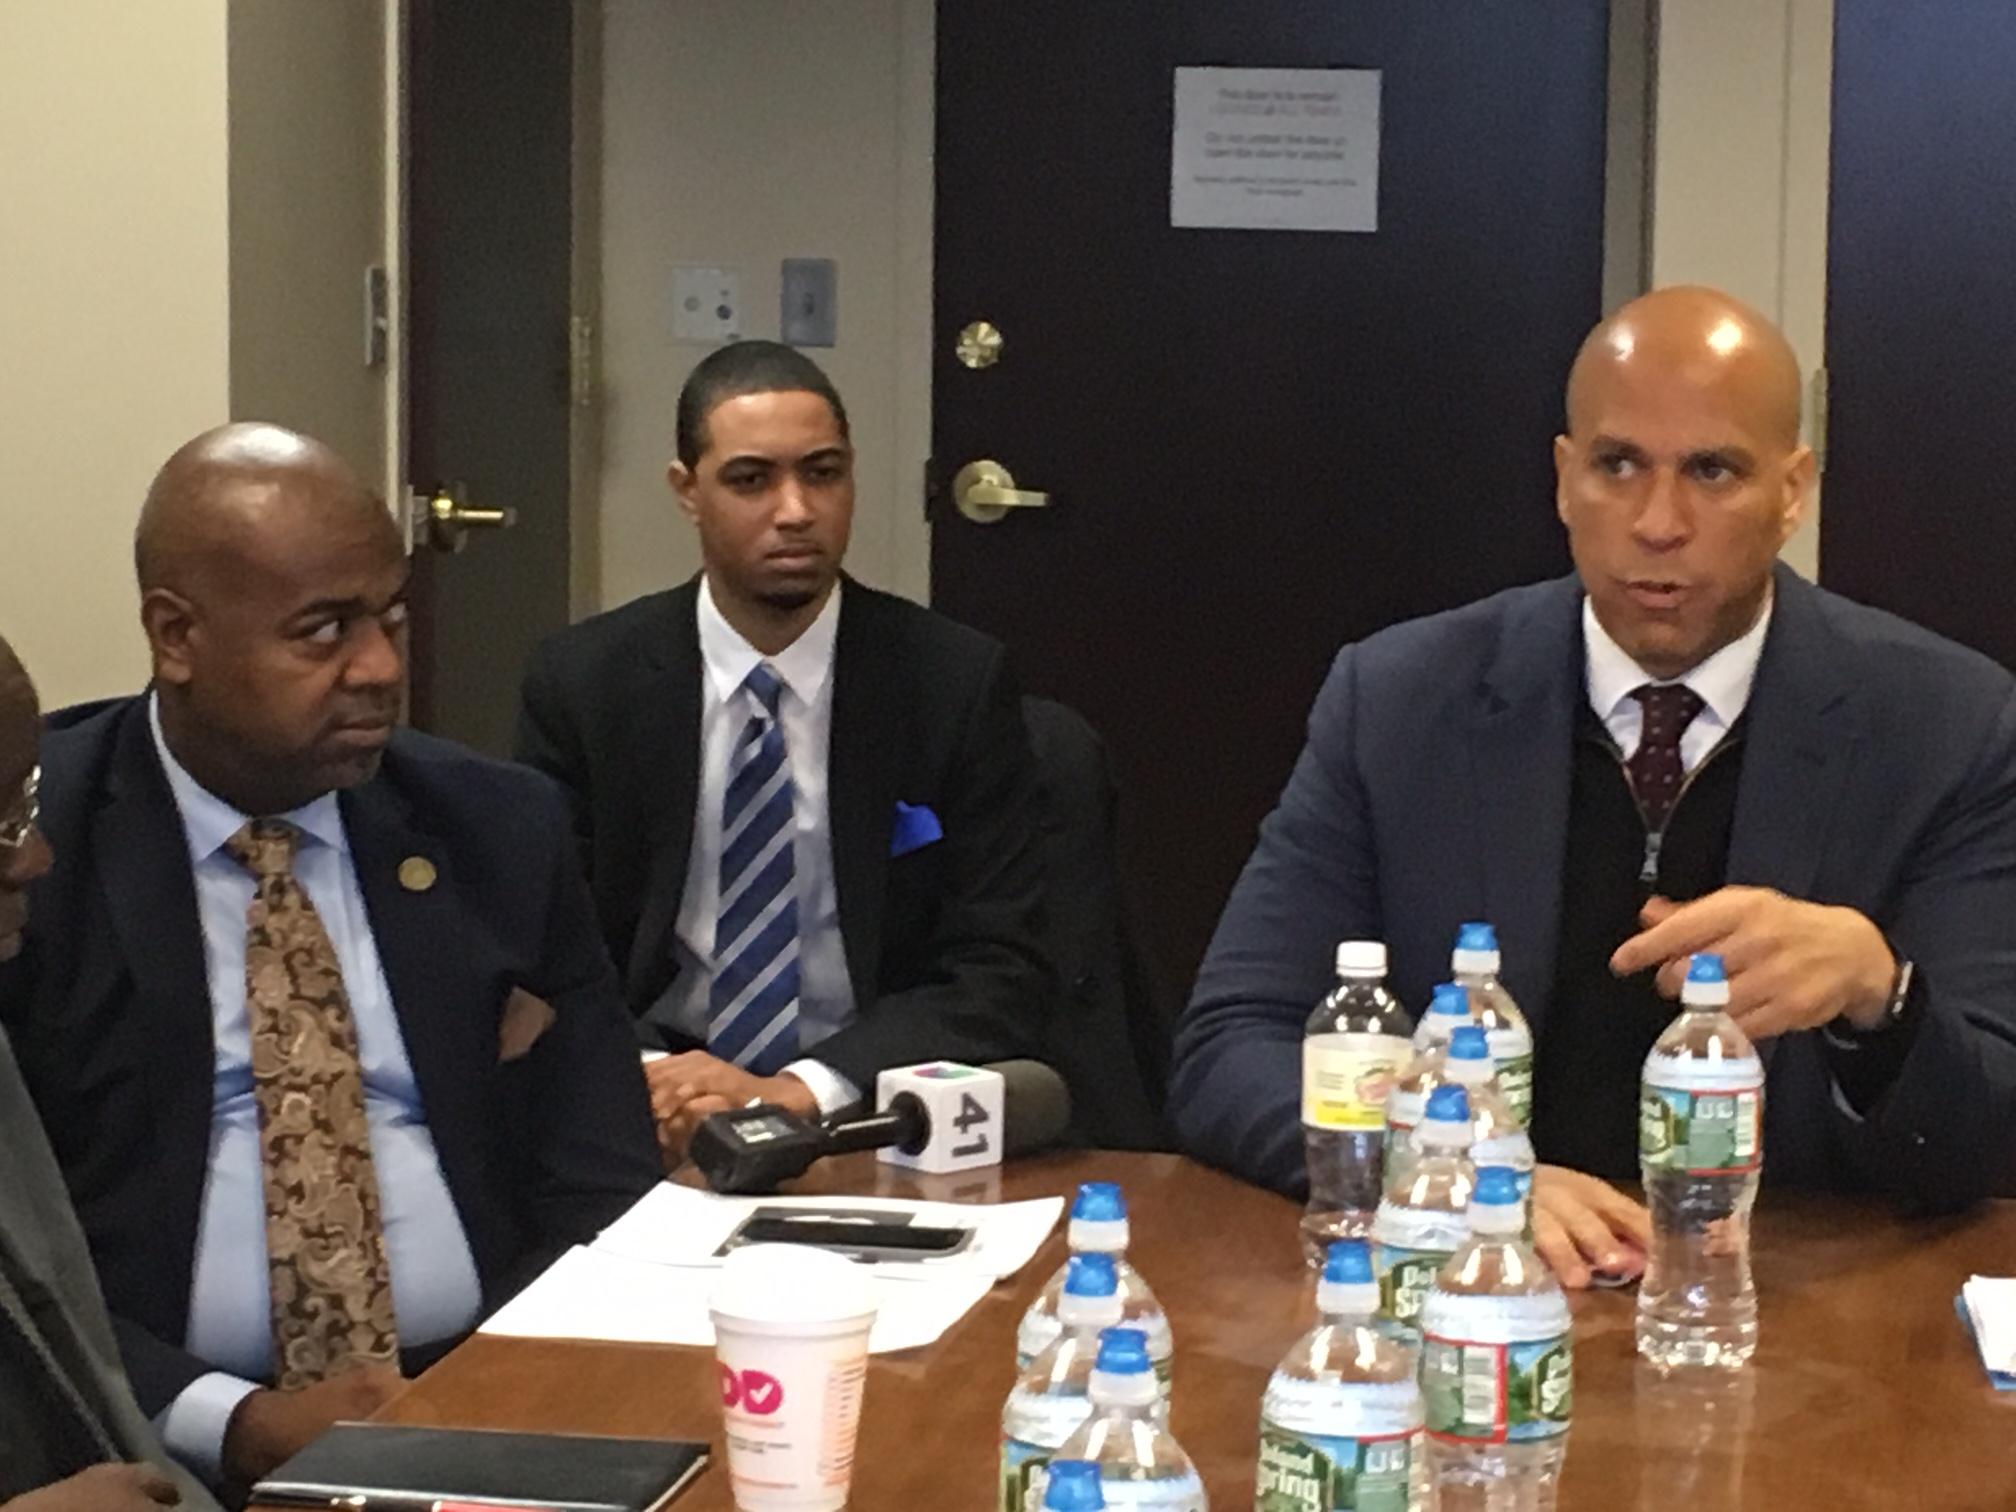 Newark Mayor Ras Baraka (left) and U.S. Senator Cory Booker say they will fight to protect NJ urban communities.